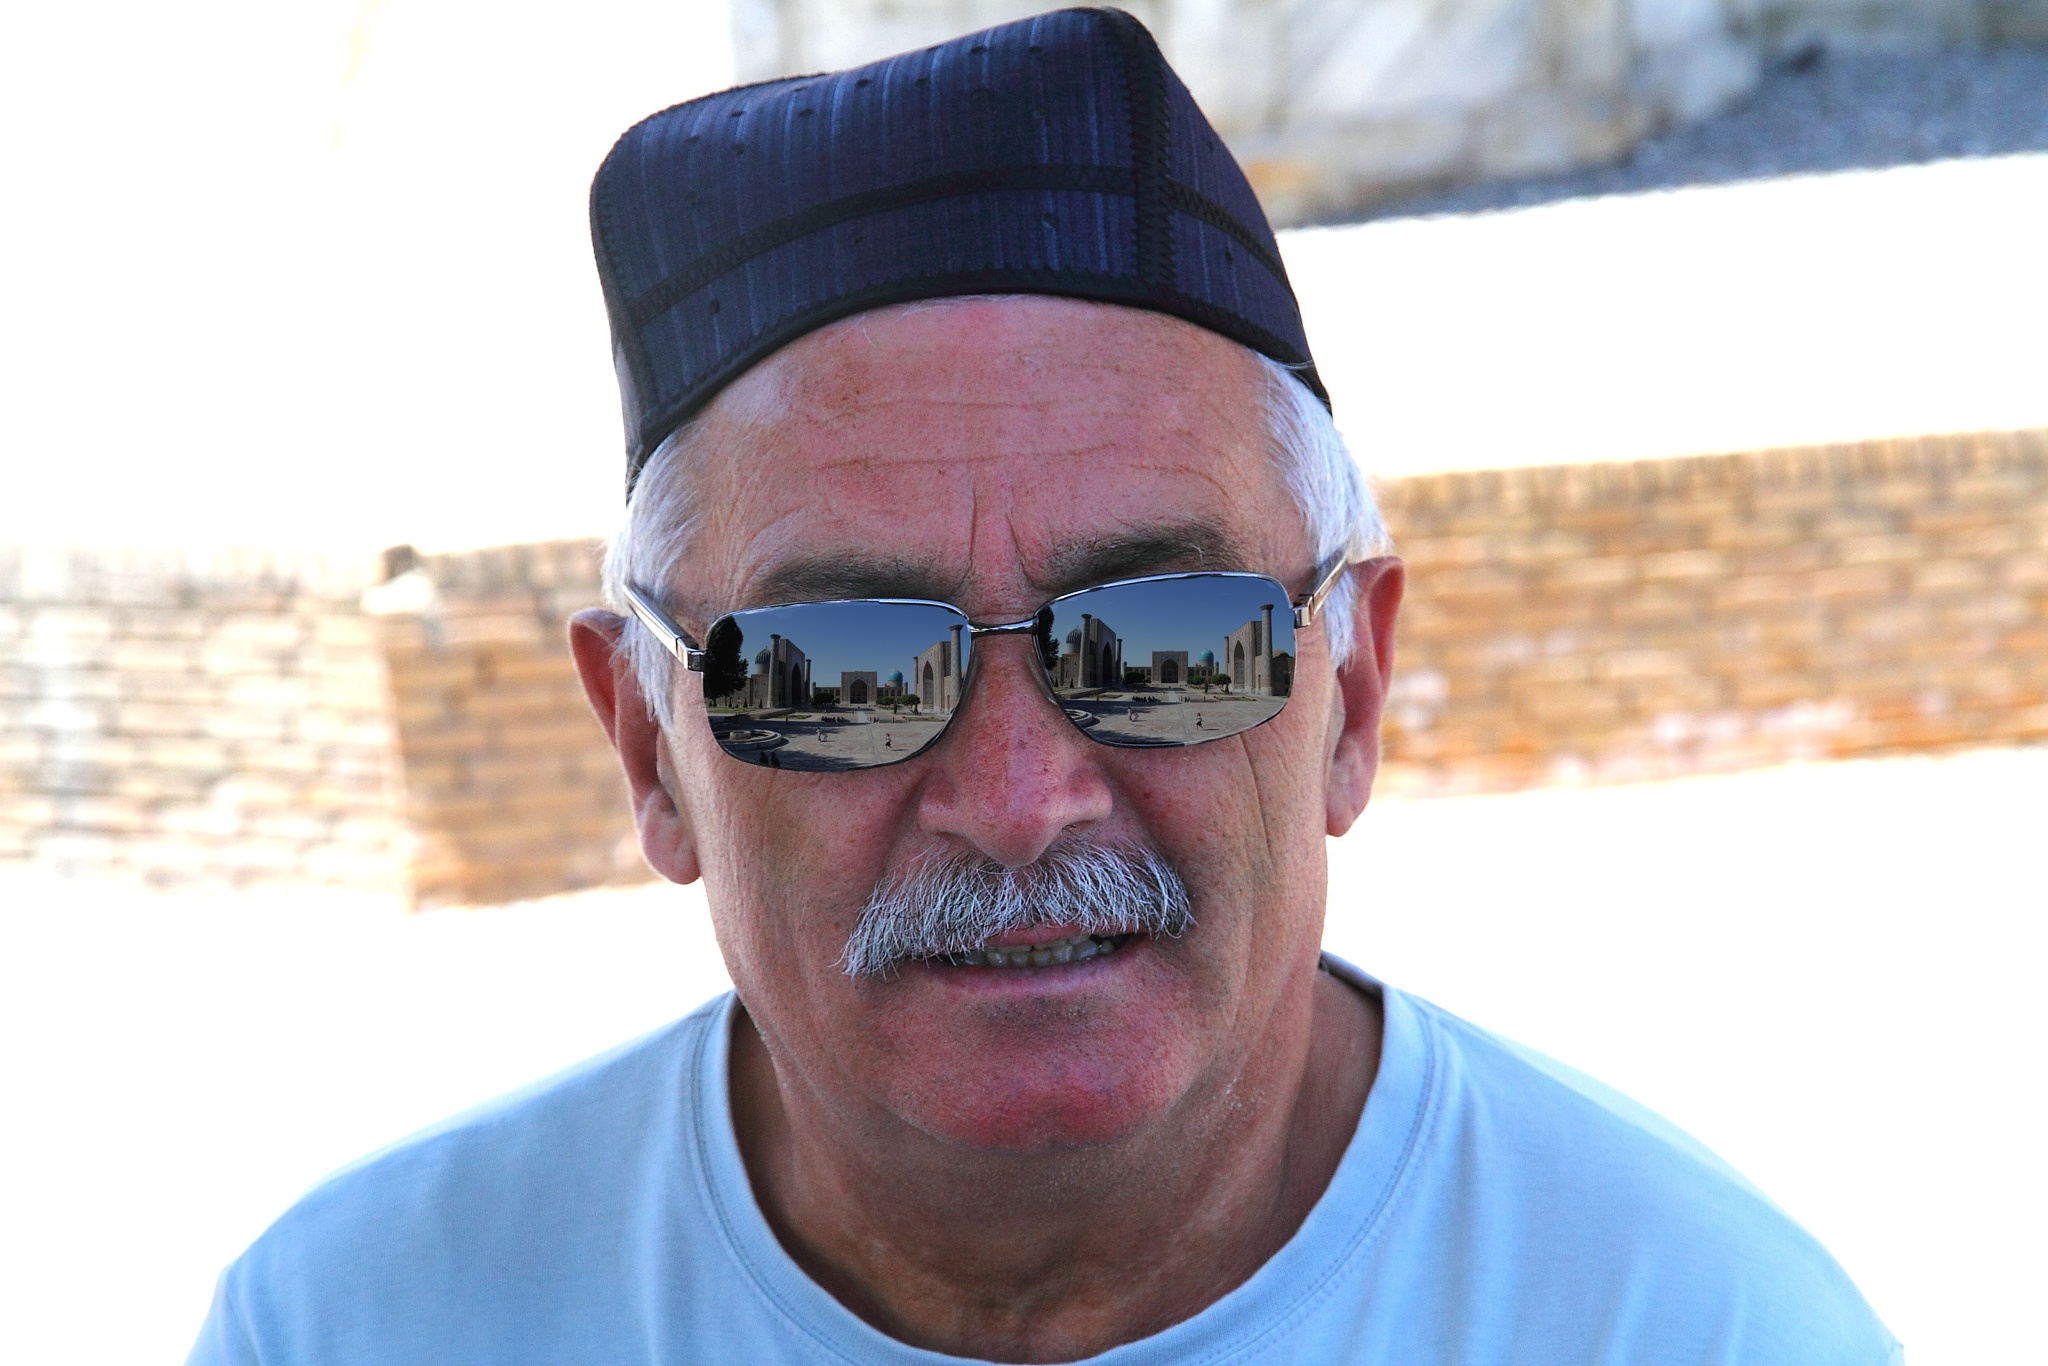 Riflesso by Maurizio